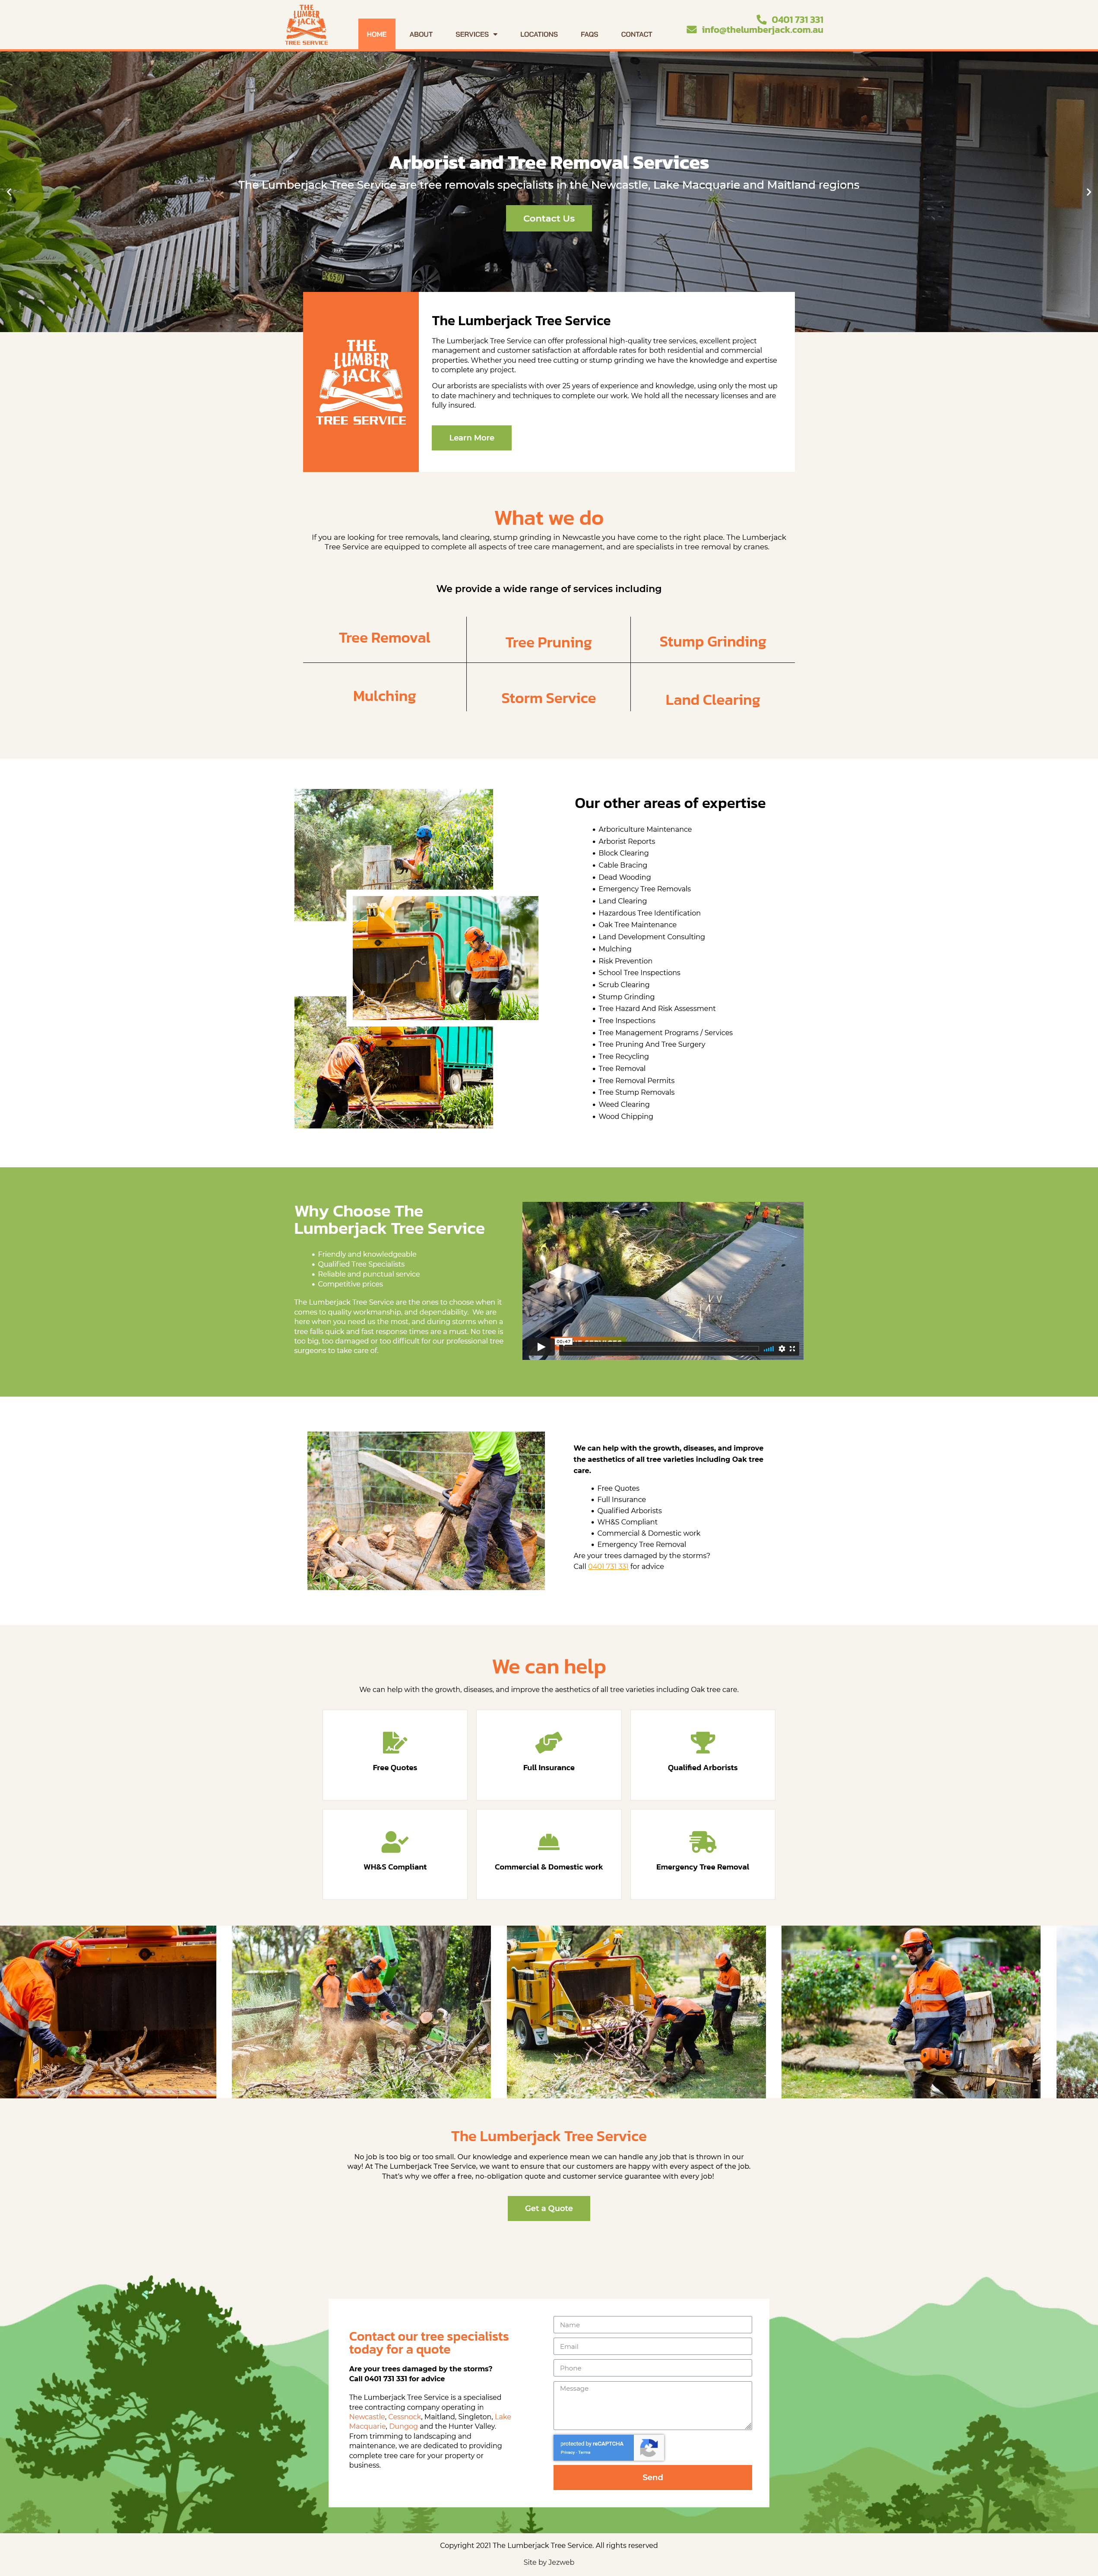 The Lumberjack Tree Service -